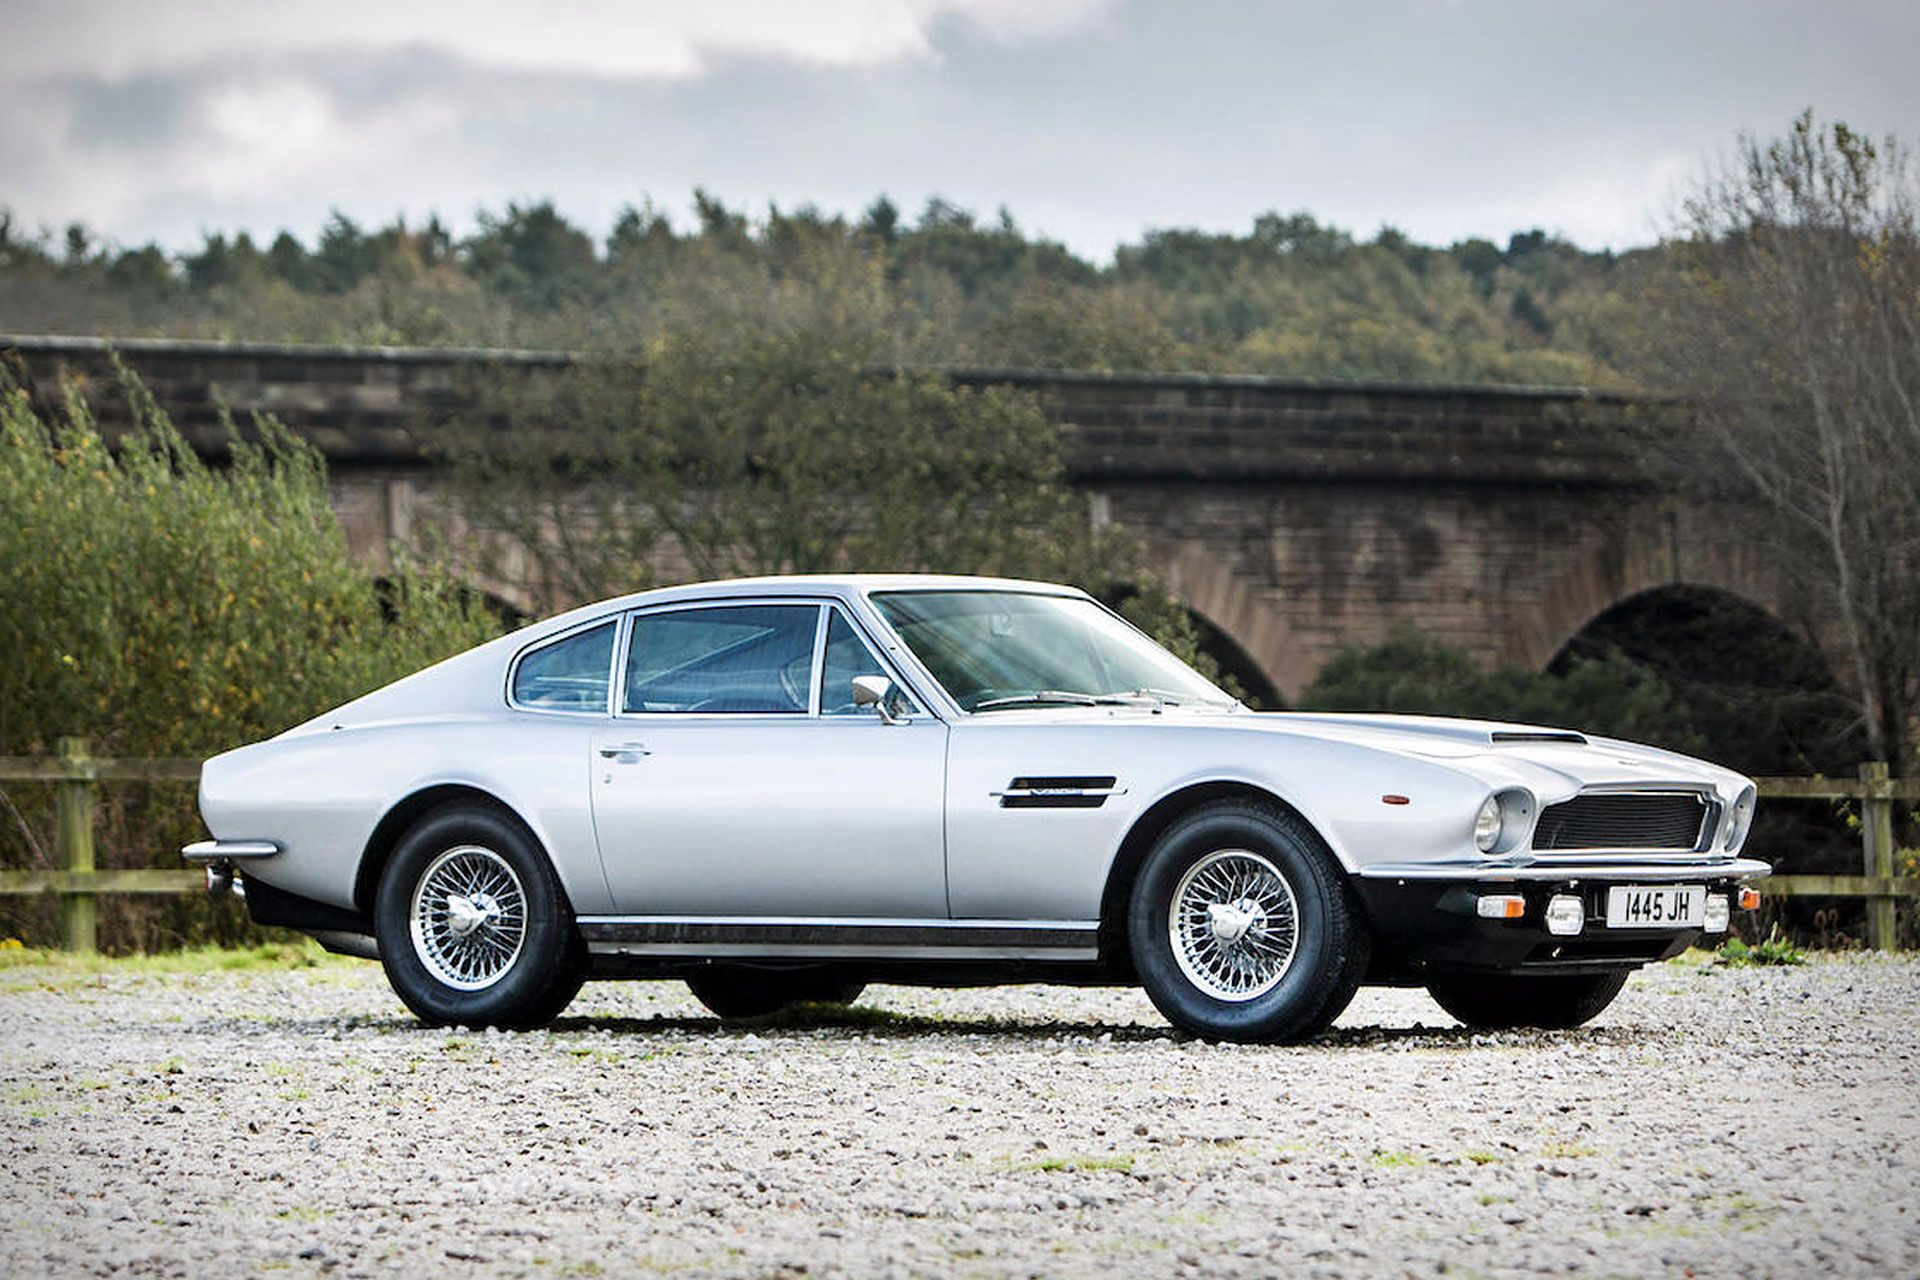 1973 Aston Martin Vantage Aston Martin Vantage Aston Martin Aston Martin Dbs